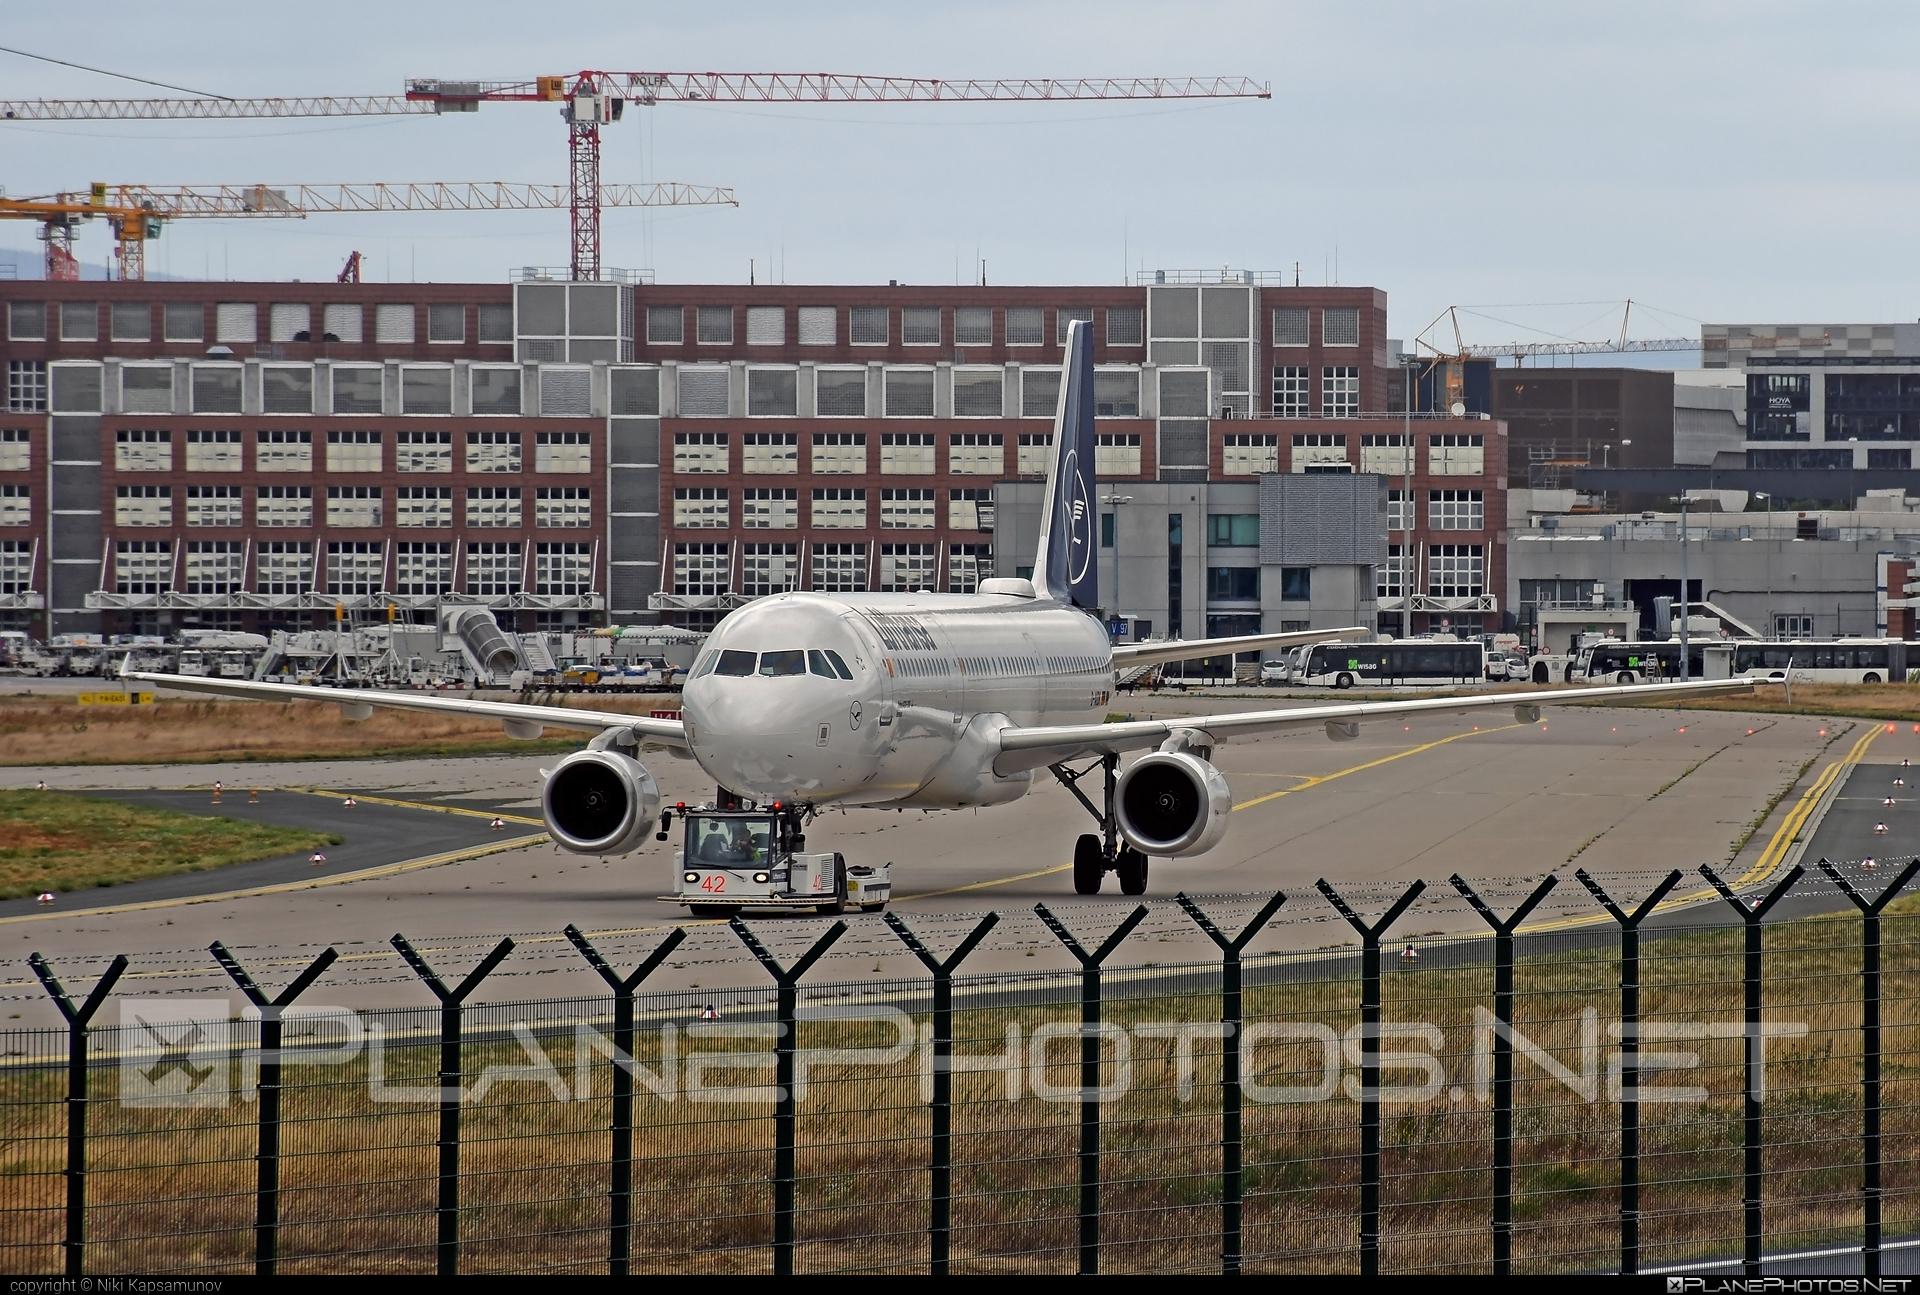 Airbus A321-231 - D-AIDK operated by Lufthansa #a320family #a321 #airbus #airbus321 #lufthansa